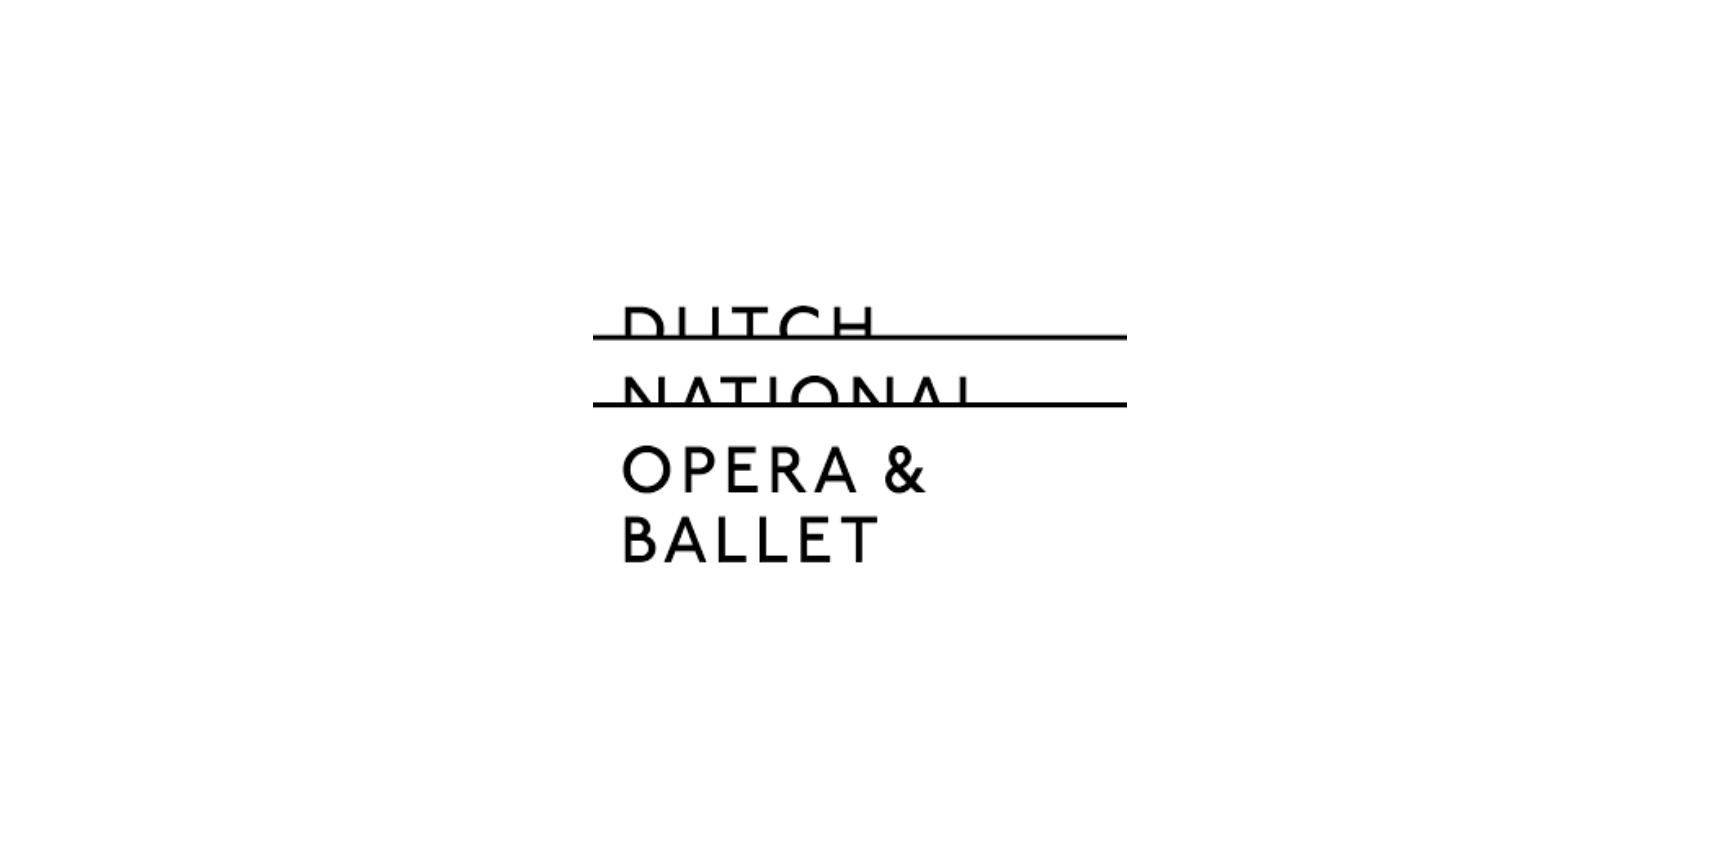 Dutch National Opera announces season 21/22